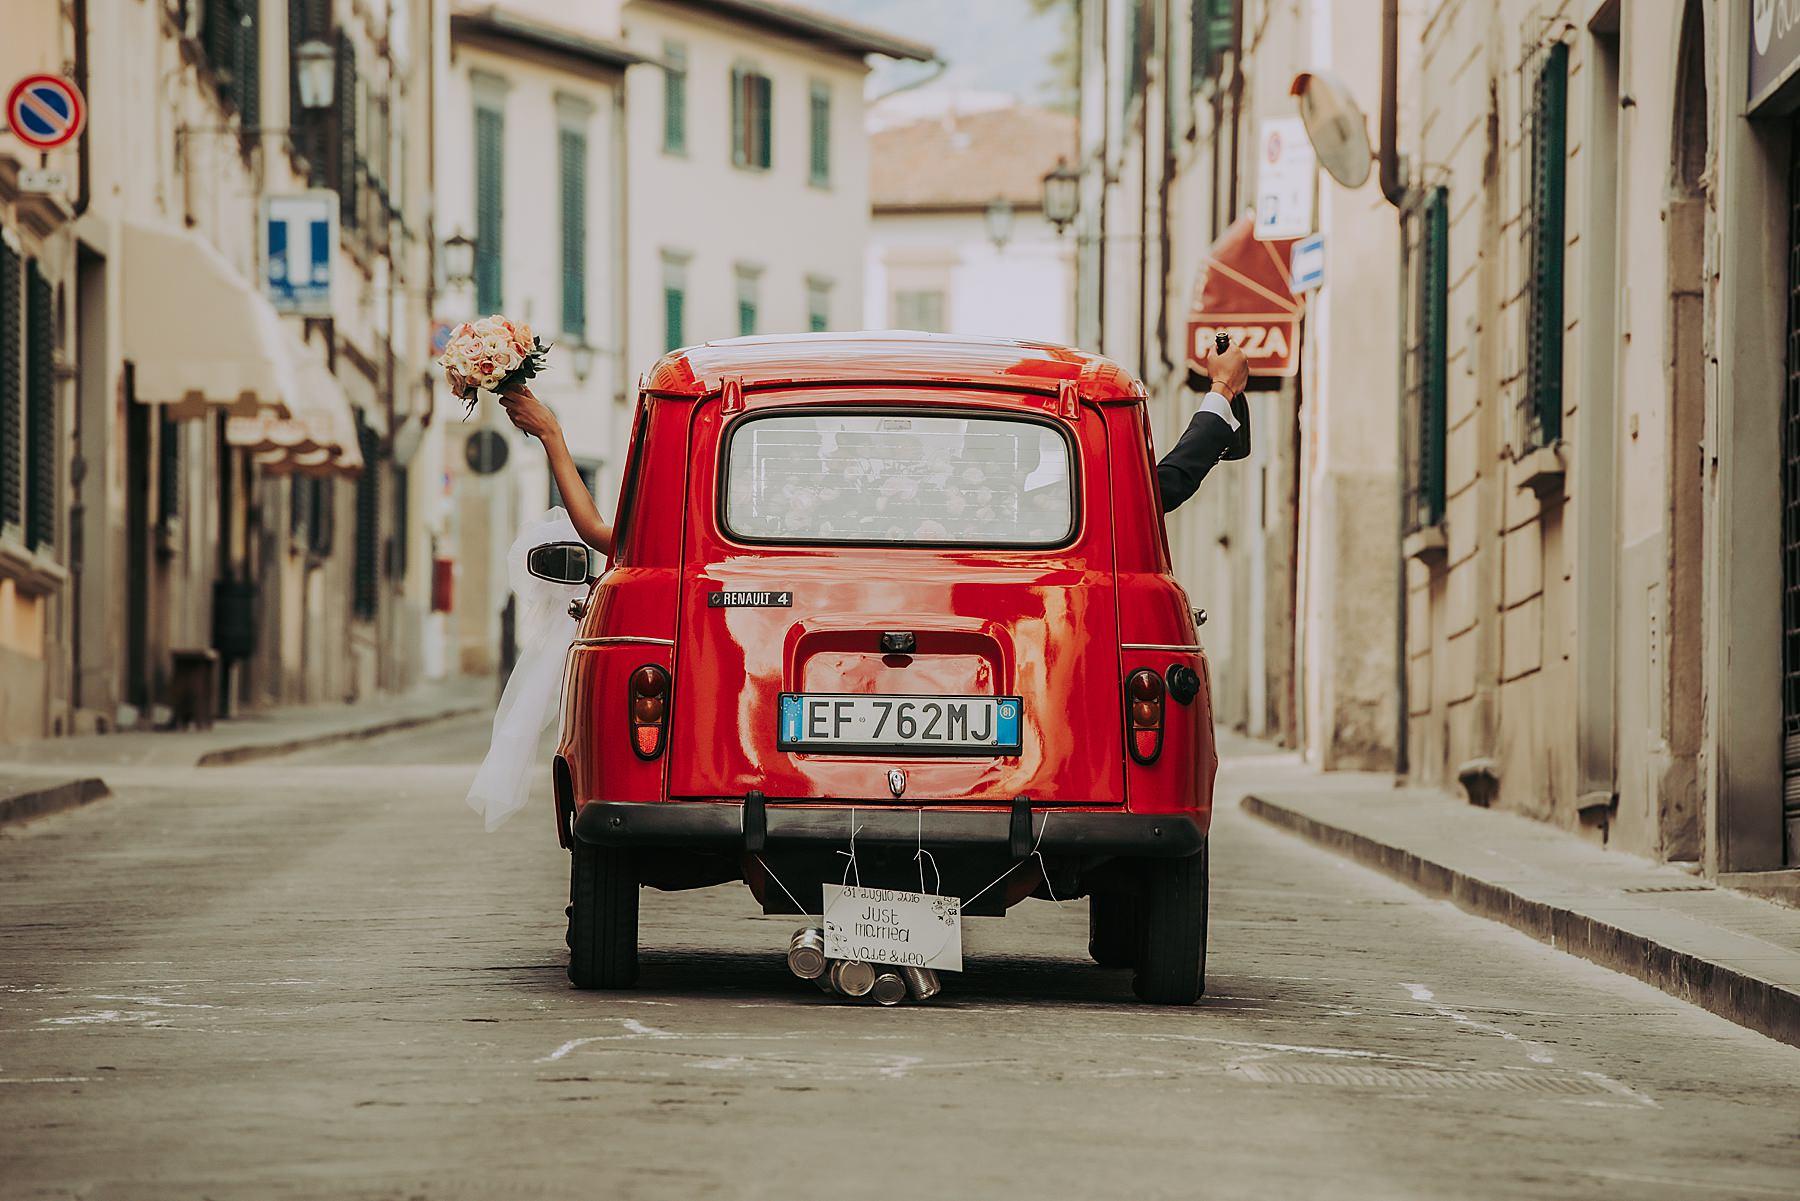 Matrimonio macchina sposi barattoli legati dietro auto